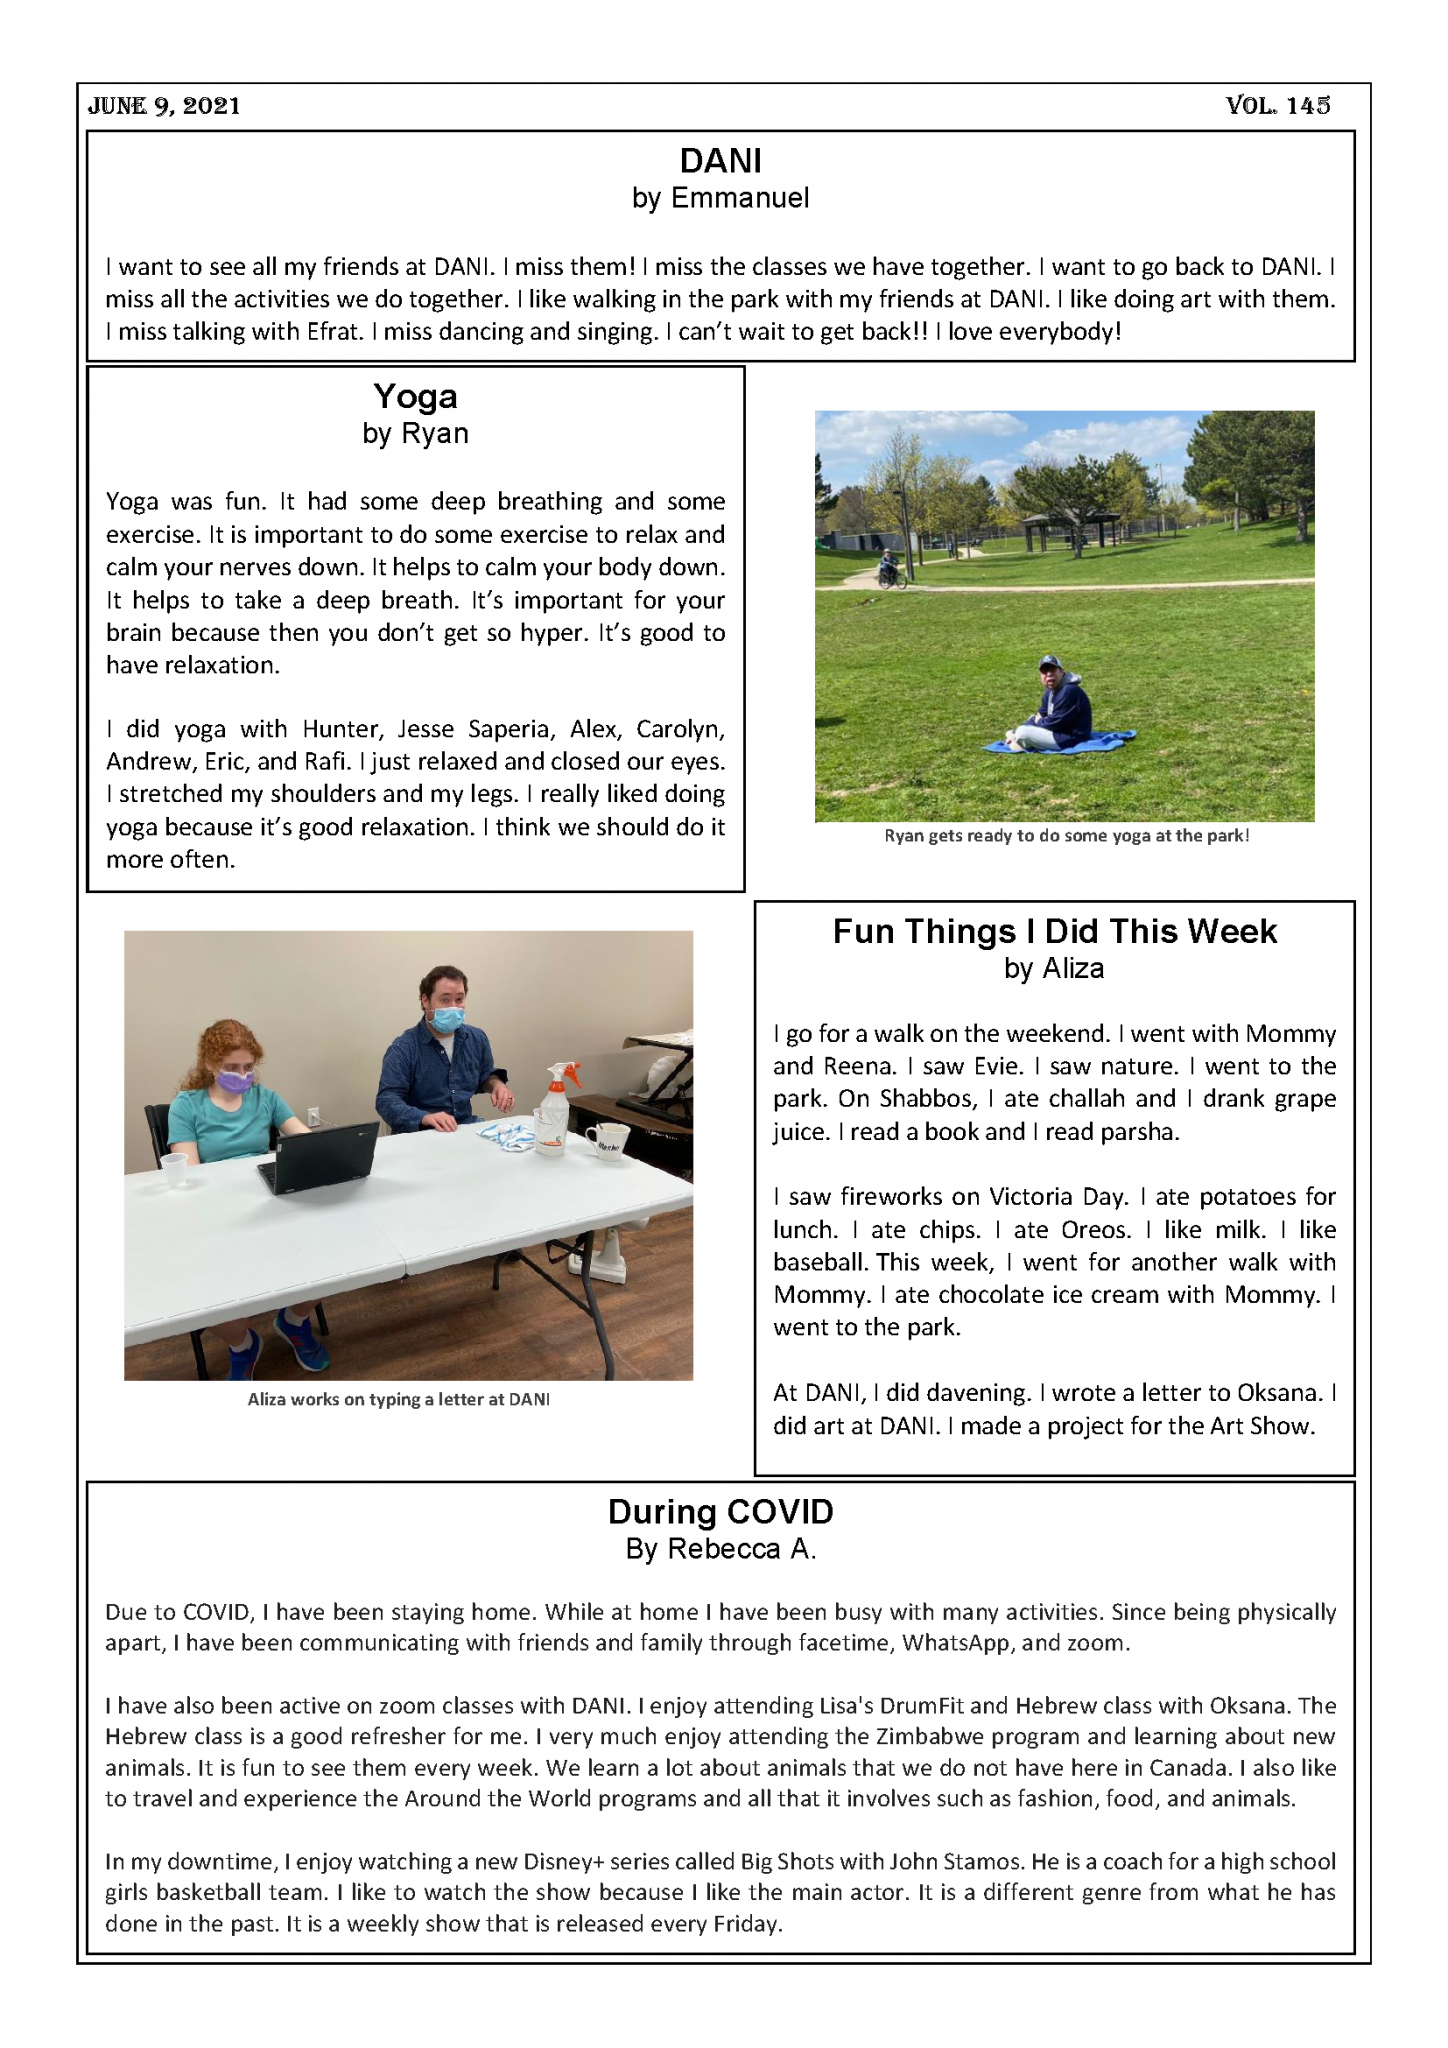 DANI Days Volume 145_Page_12